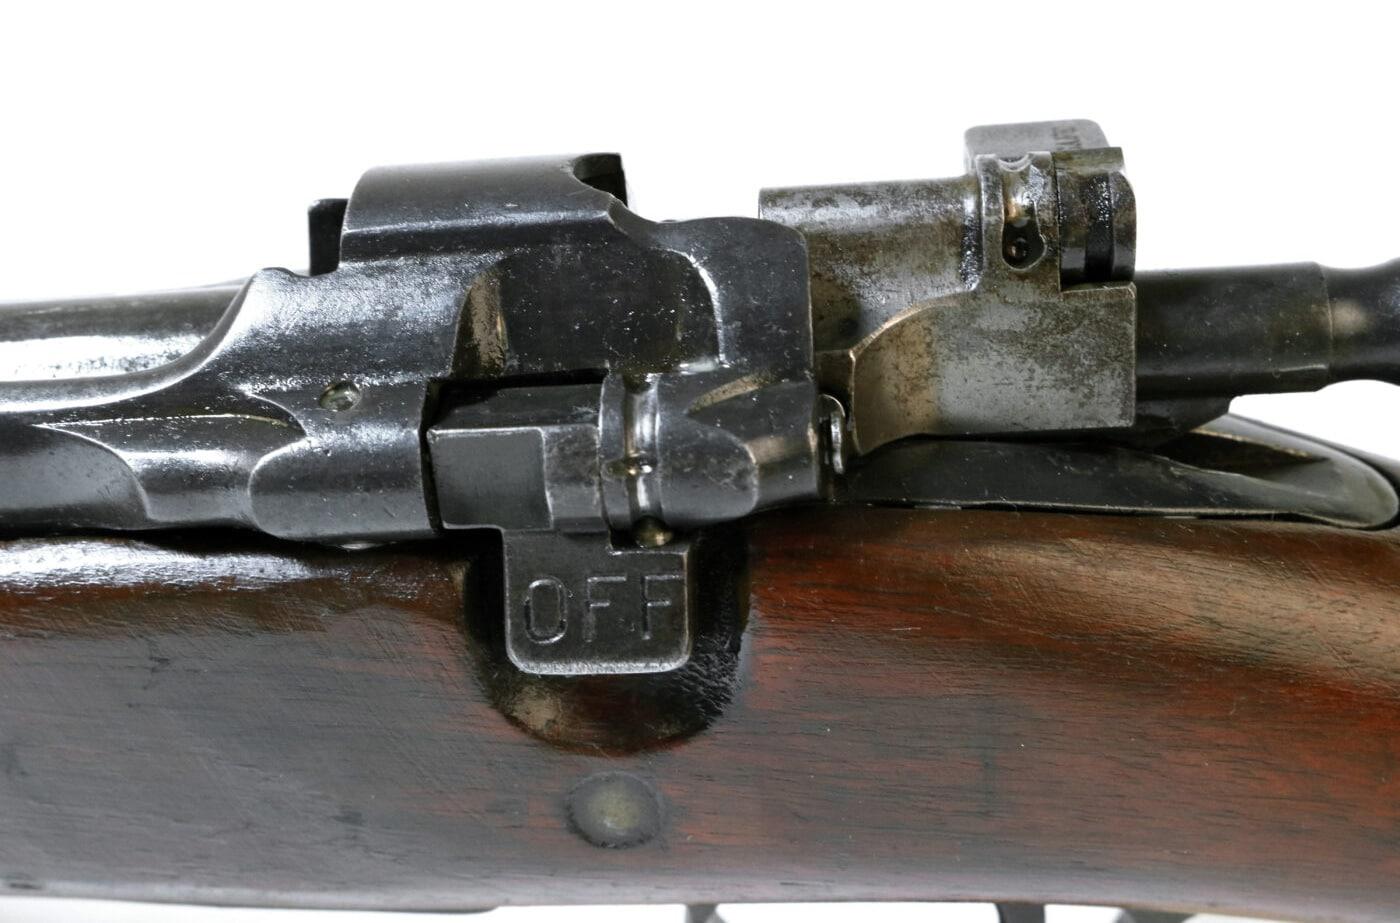 M1903 magazine cut off